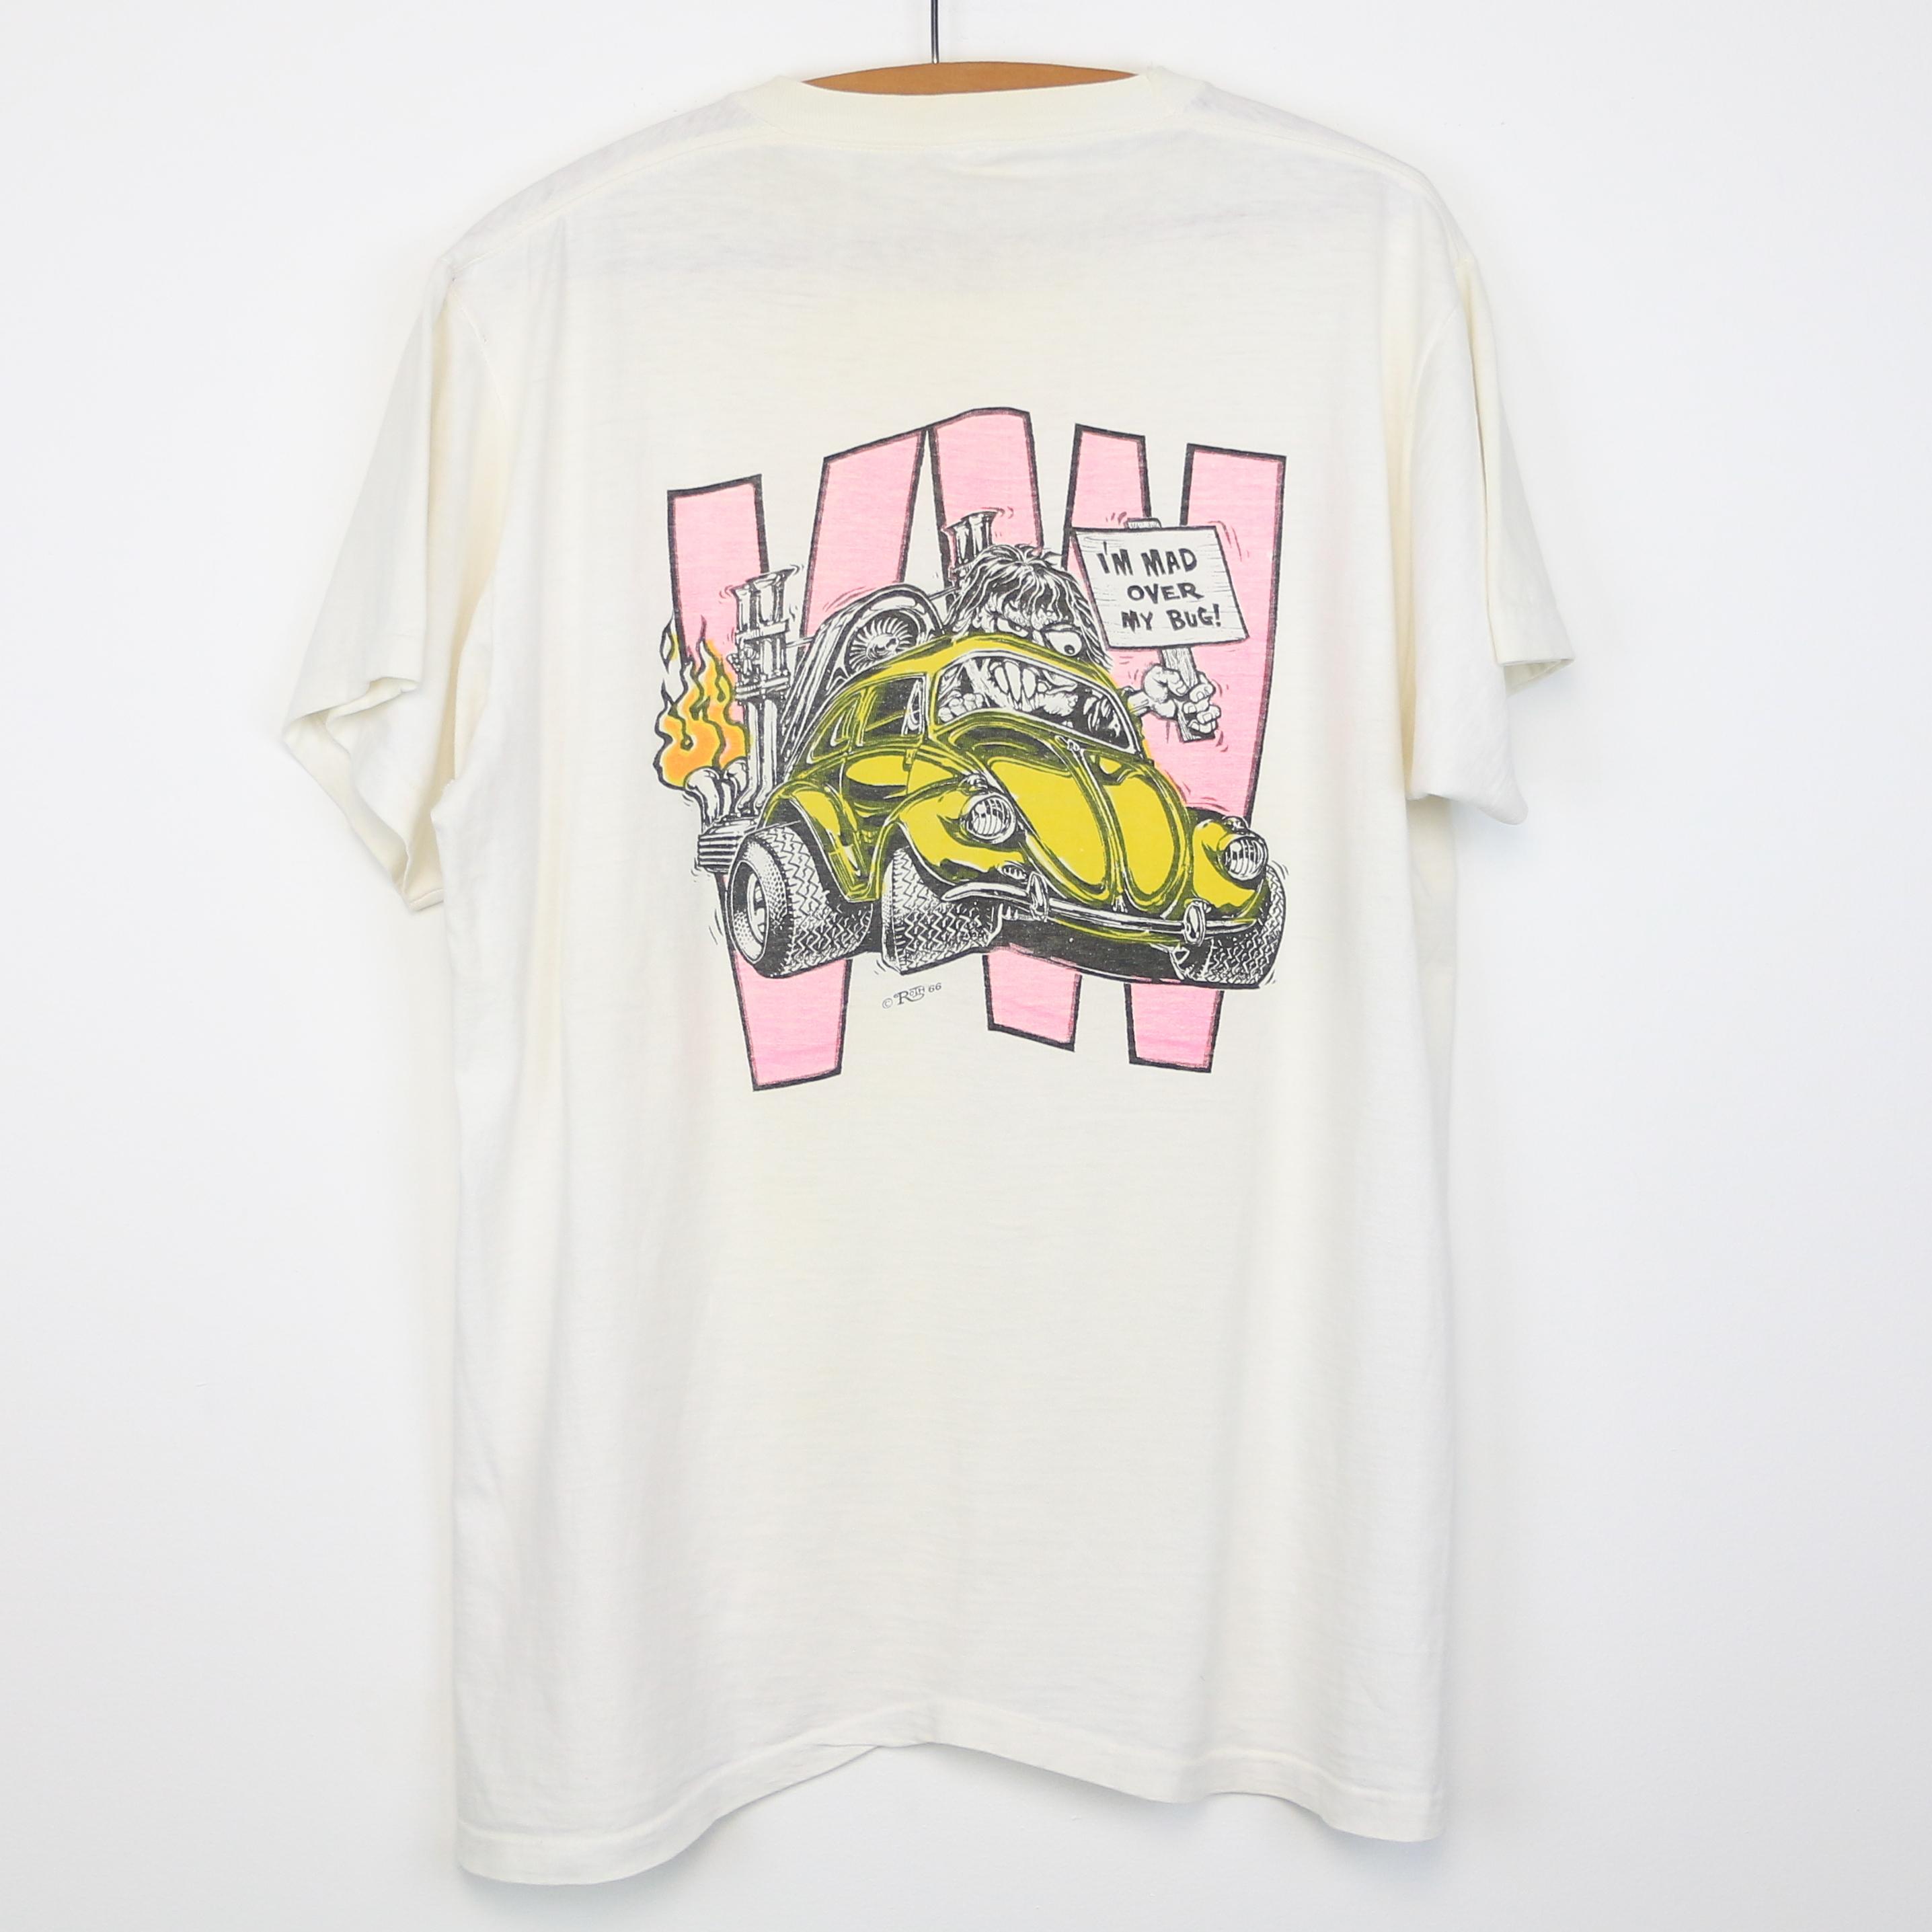 big daddy ed roth shirt vintage tshirt 1966 volkswagen tee mad over my bug 1960s ebay. Black Bedroom Furniture Sets. Home Design Ideas